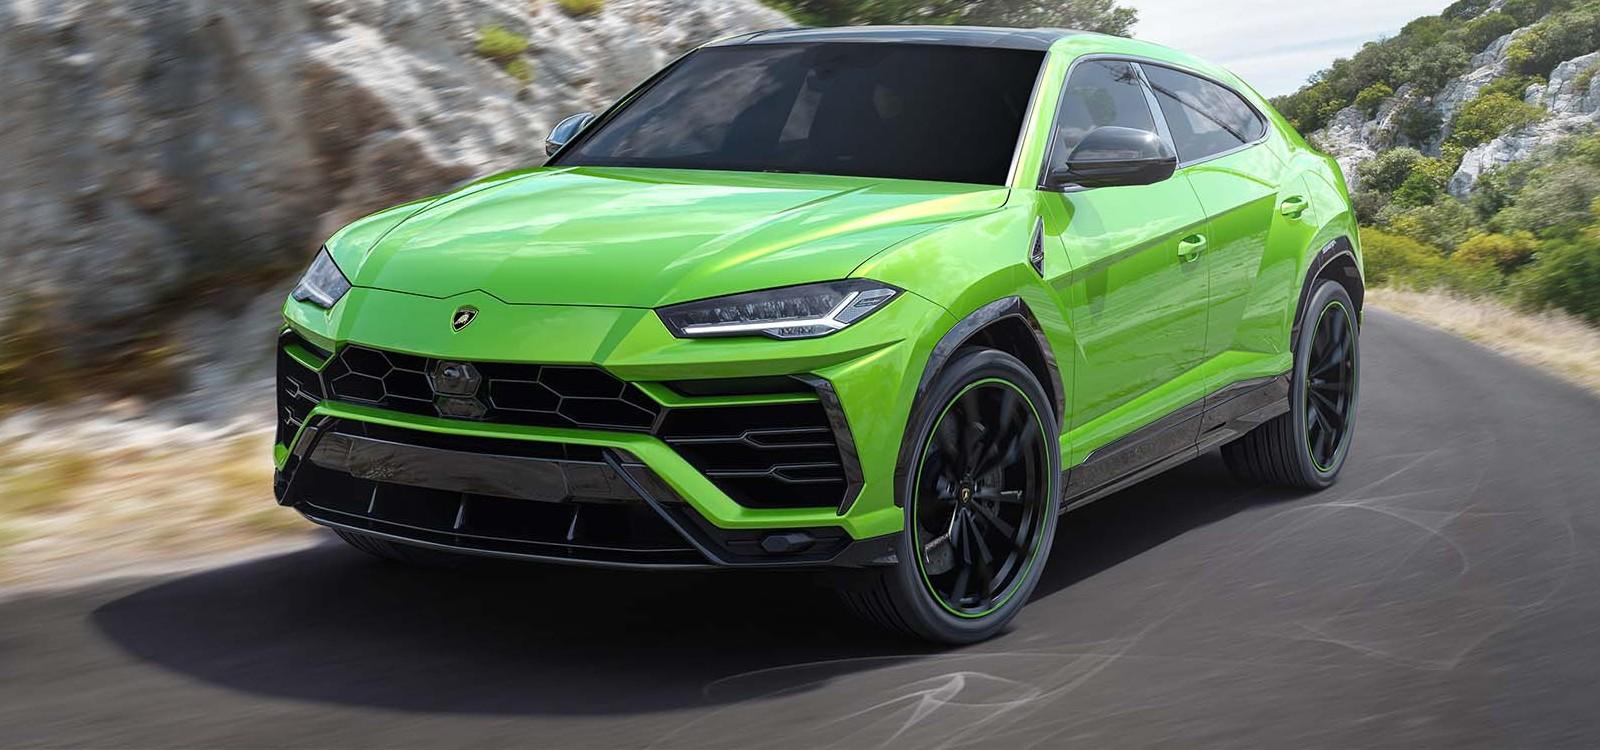 Lamborghini-URUS-Pearl-Capsule-Edition-Launched-in-India